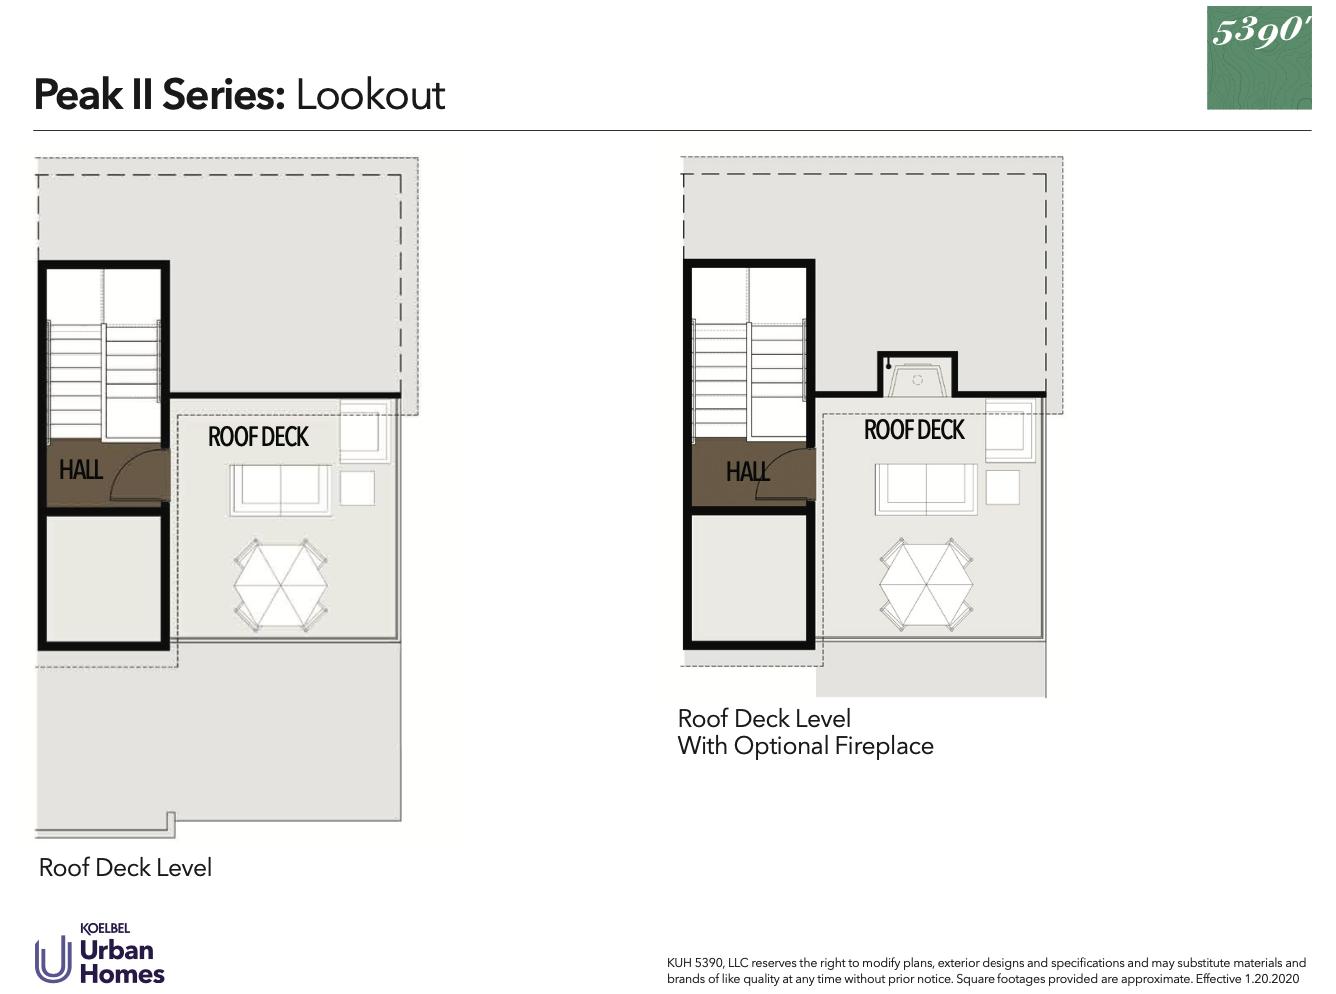 5390' Community by Koelbel in the Berkeley Tennyson Neighborhood Denver New Construction Homes For Sale Peak II Lookout Floorplan3